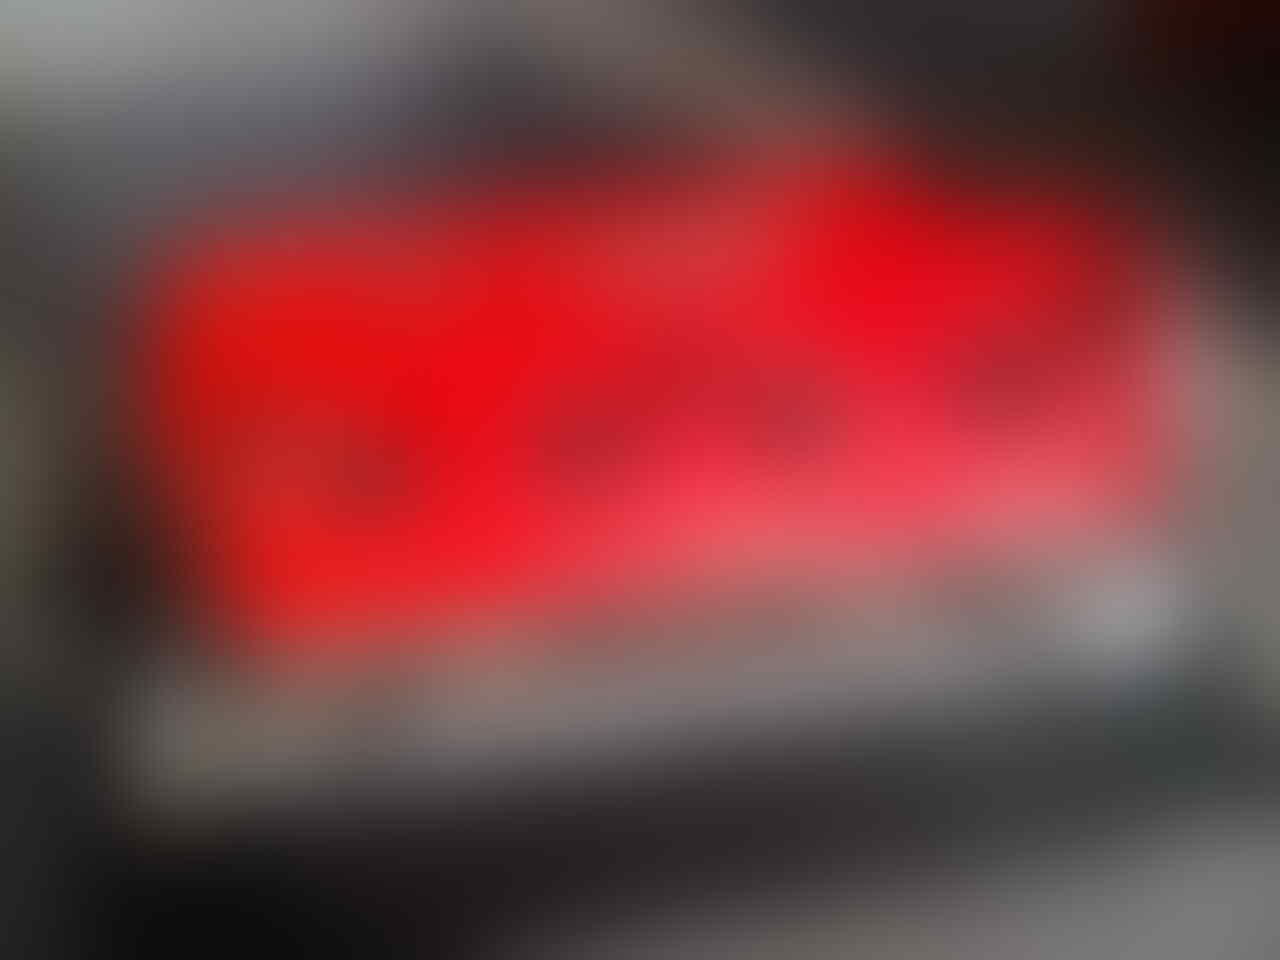 WTS : Engine Head VTEC P08 Strip 1 buat Mesin Honda D Series